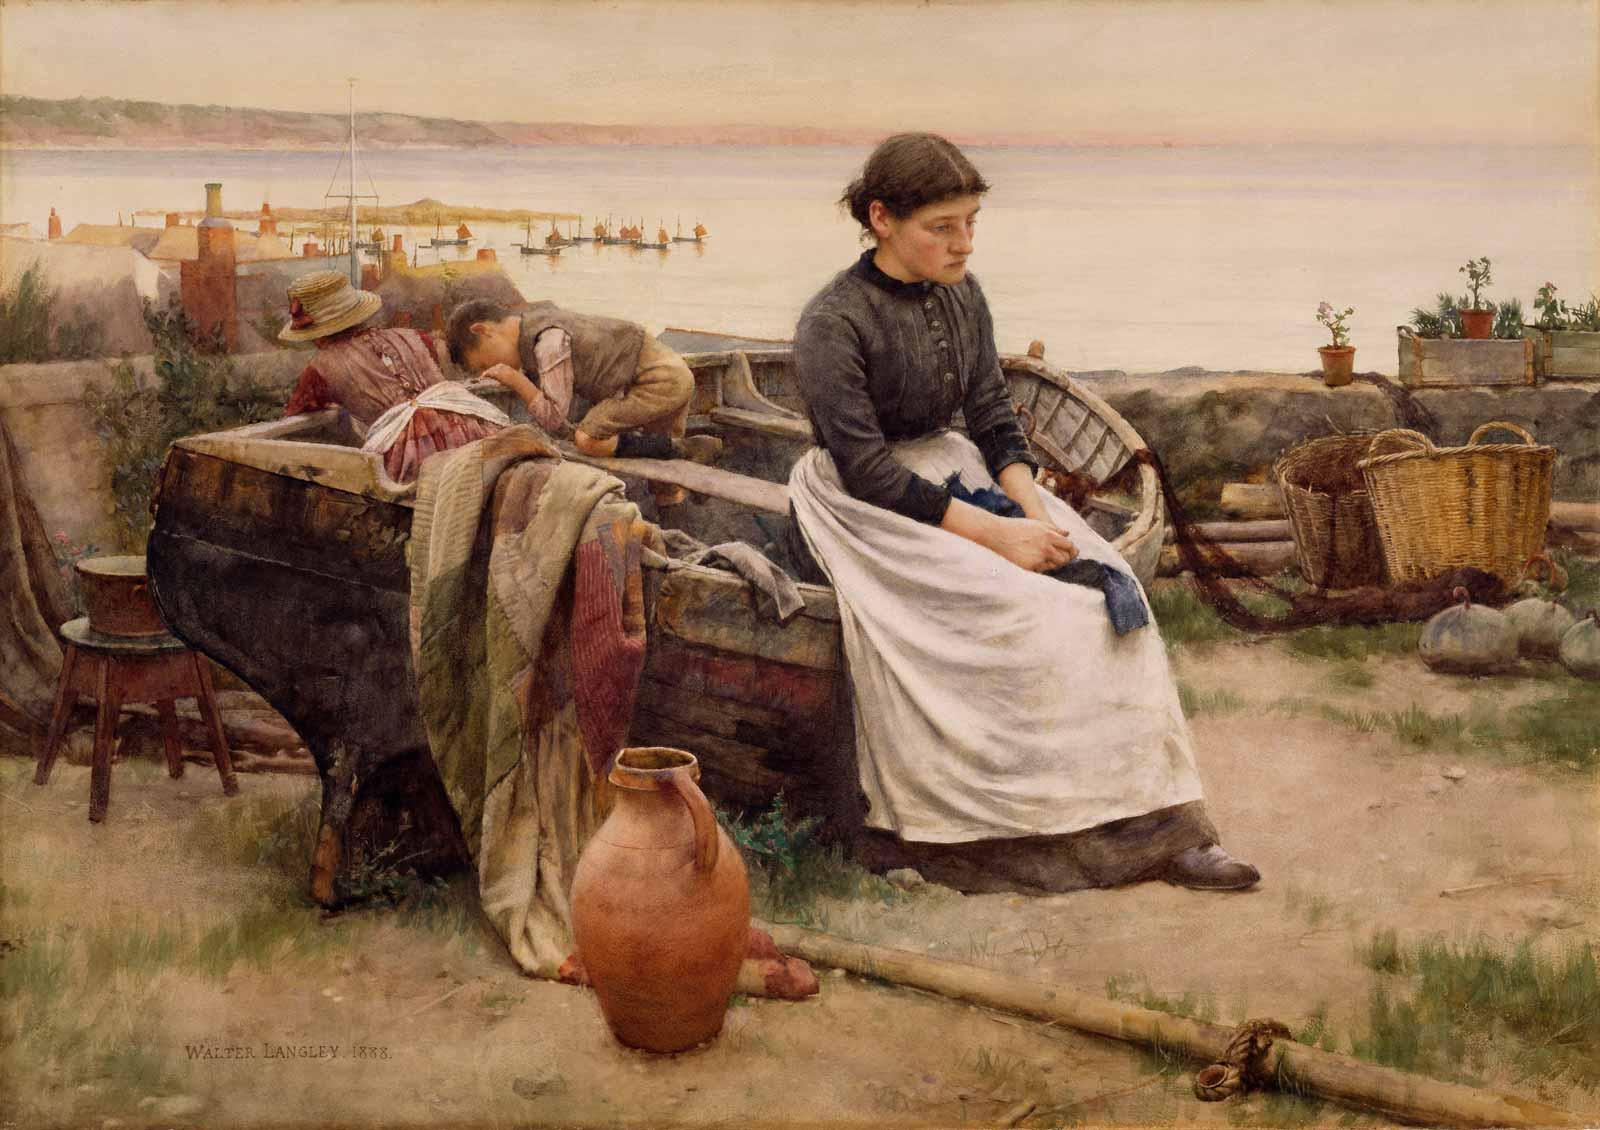 """Forgotten Feminisms: An Appeal Against 'Domestic Despotism'"""